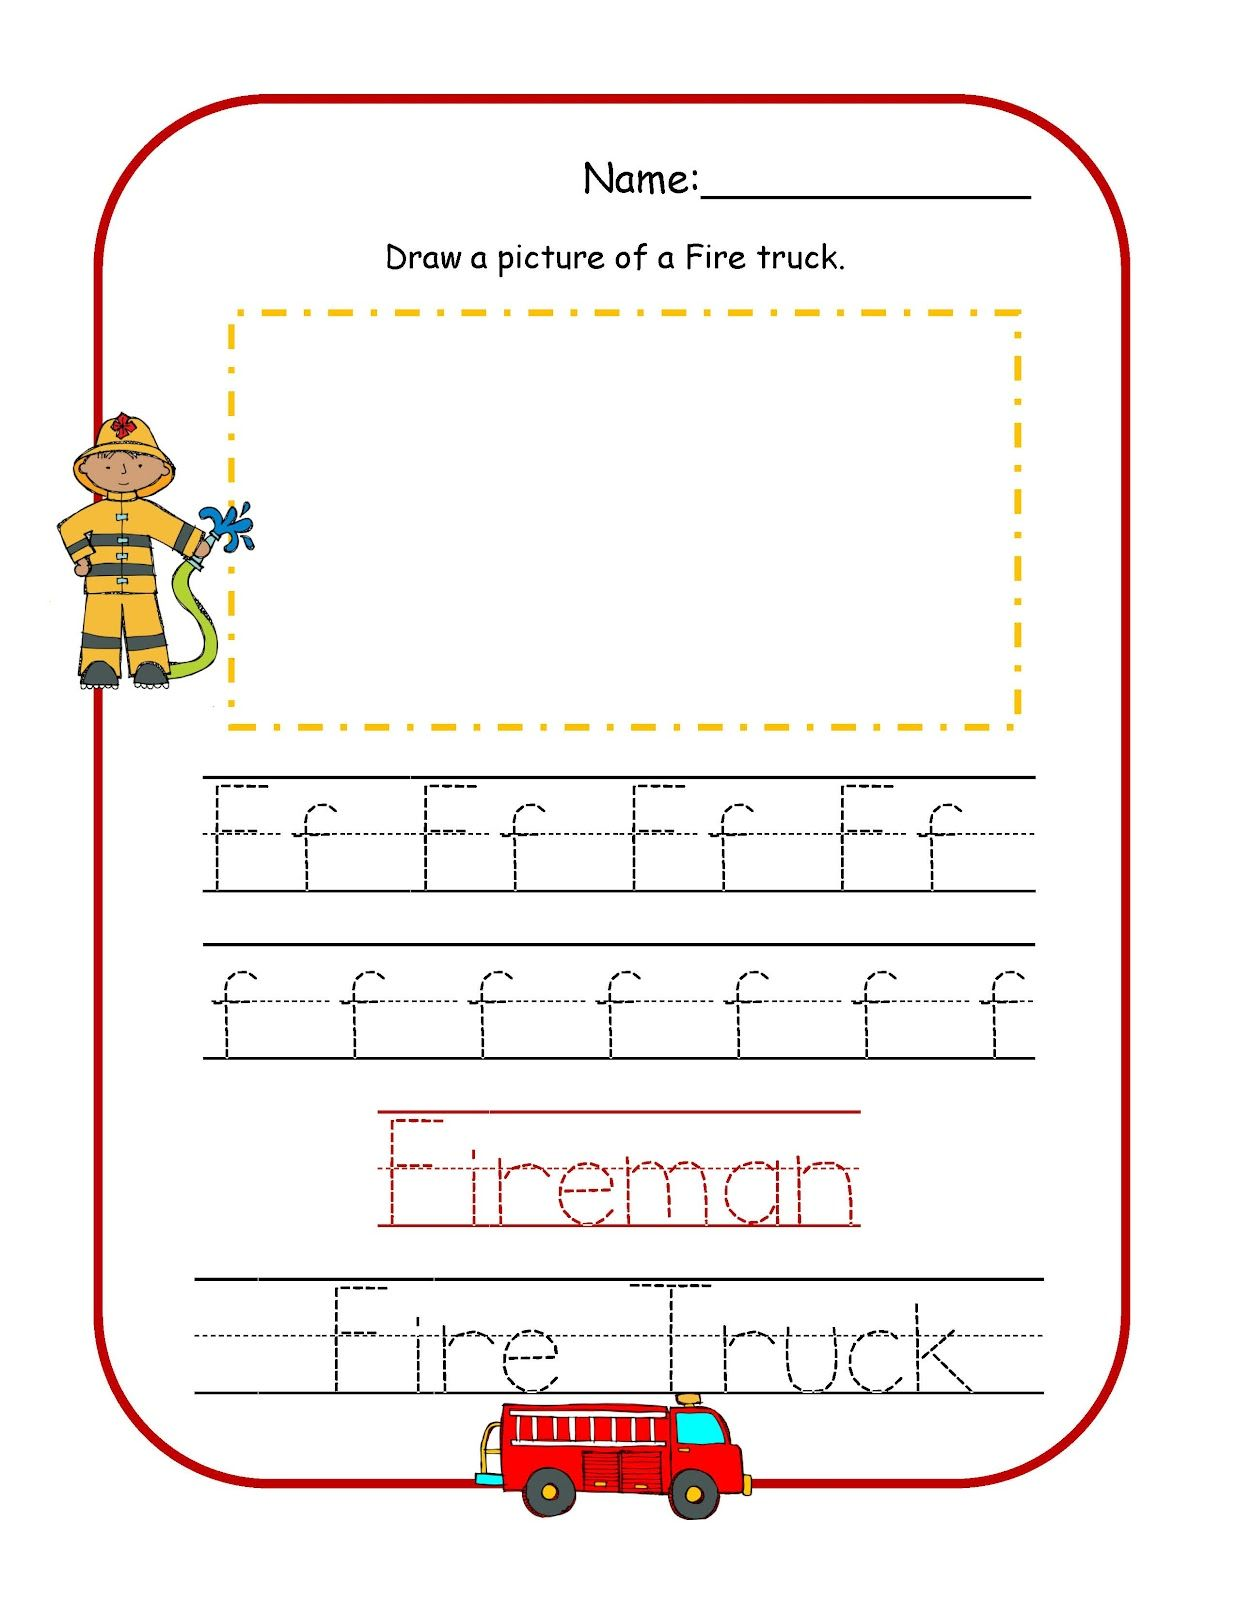 Preschool Printables Fire Safety Worksheets Fire Safety Preschool Community Helpers Preschool [ 1600 x 1236 Pixel ]